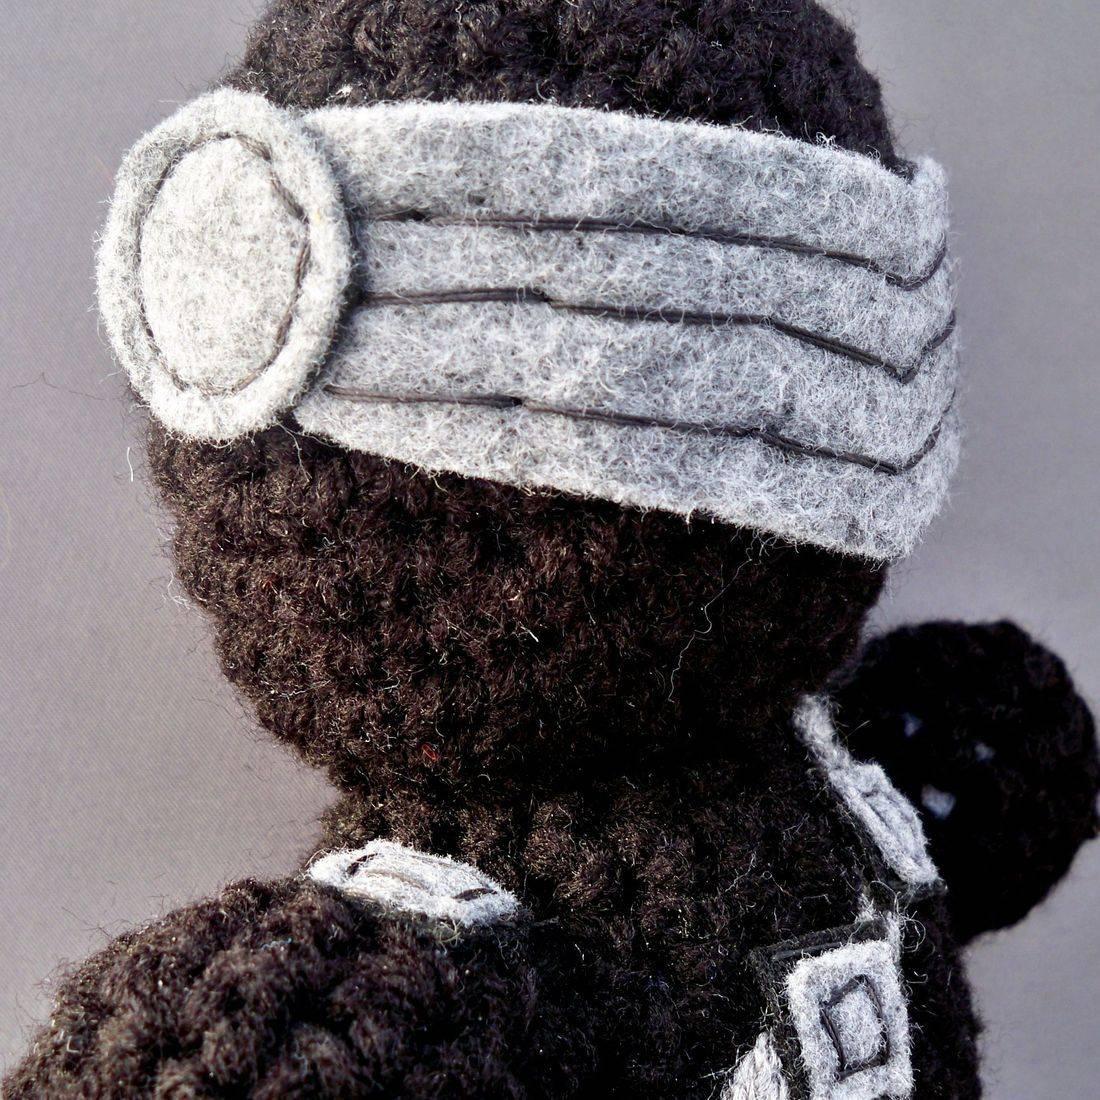 Snake Eyes, ninja, amigurumi, plush, doll, crochet, G.I. Joe, nerd, geek, handmade, crochet